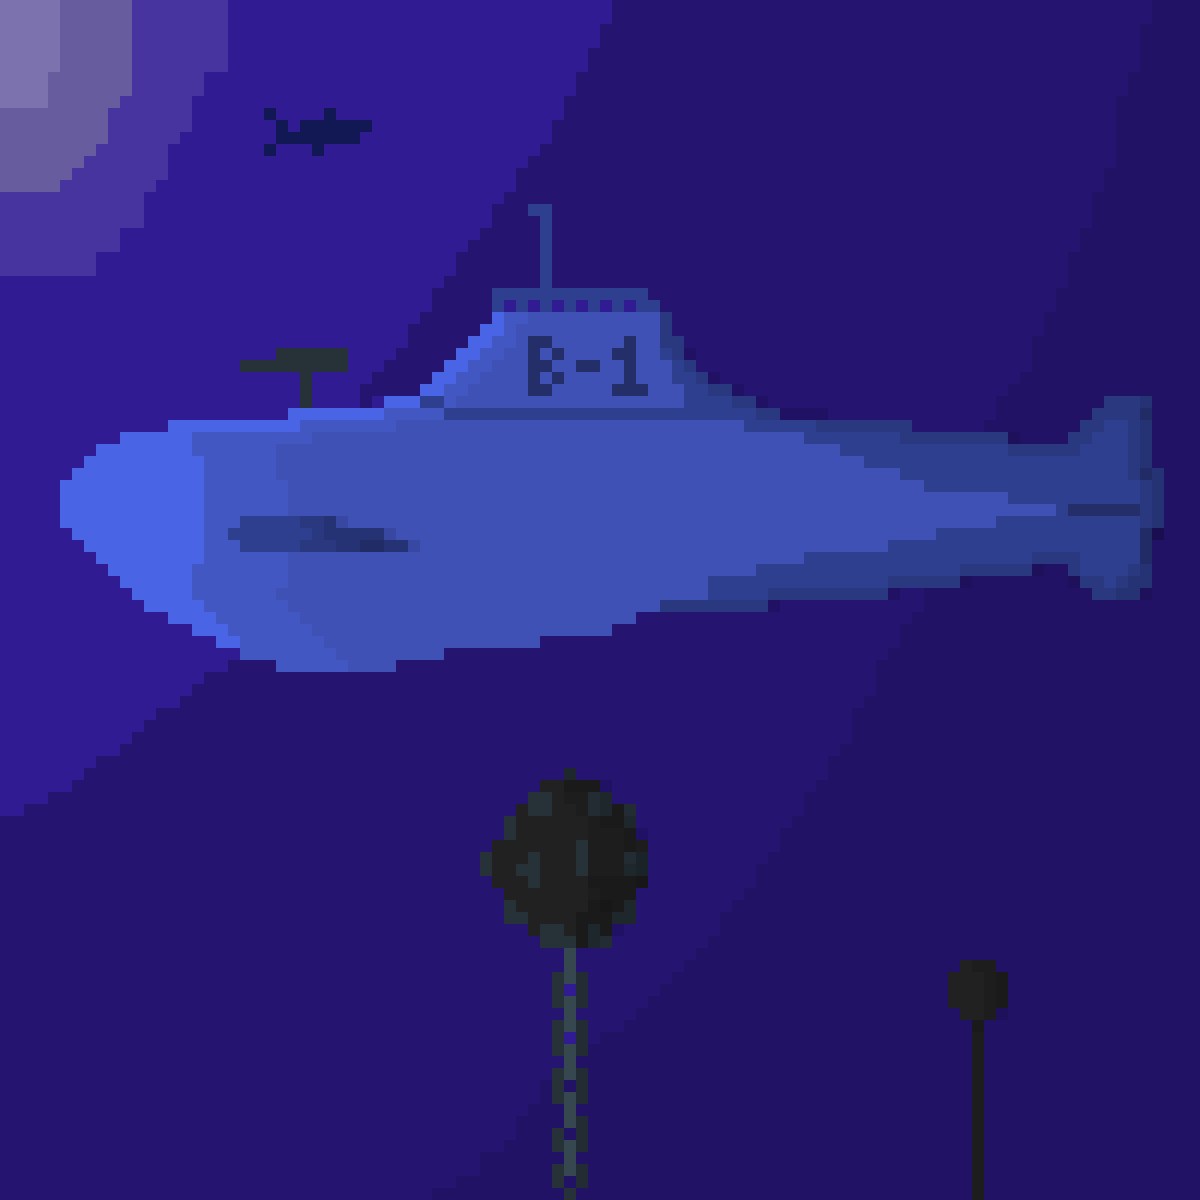 U-Boot by PixelNArt